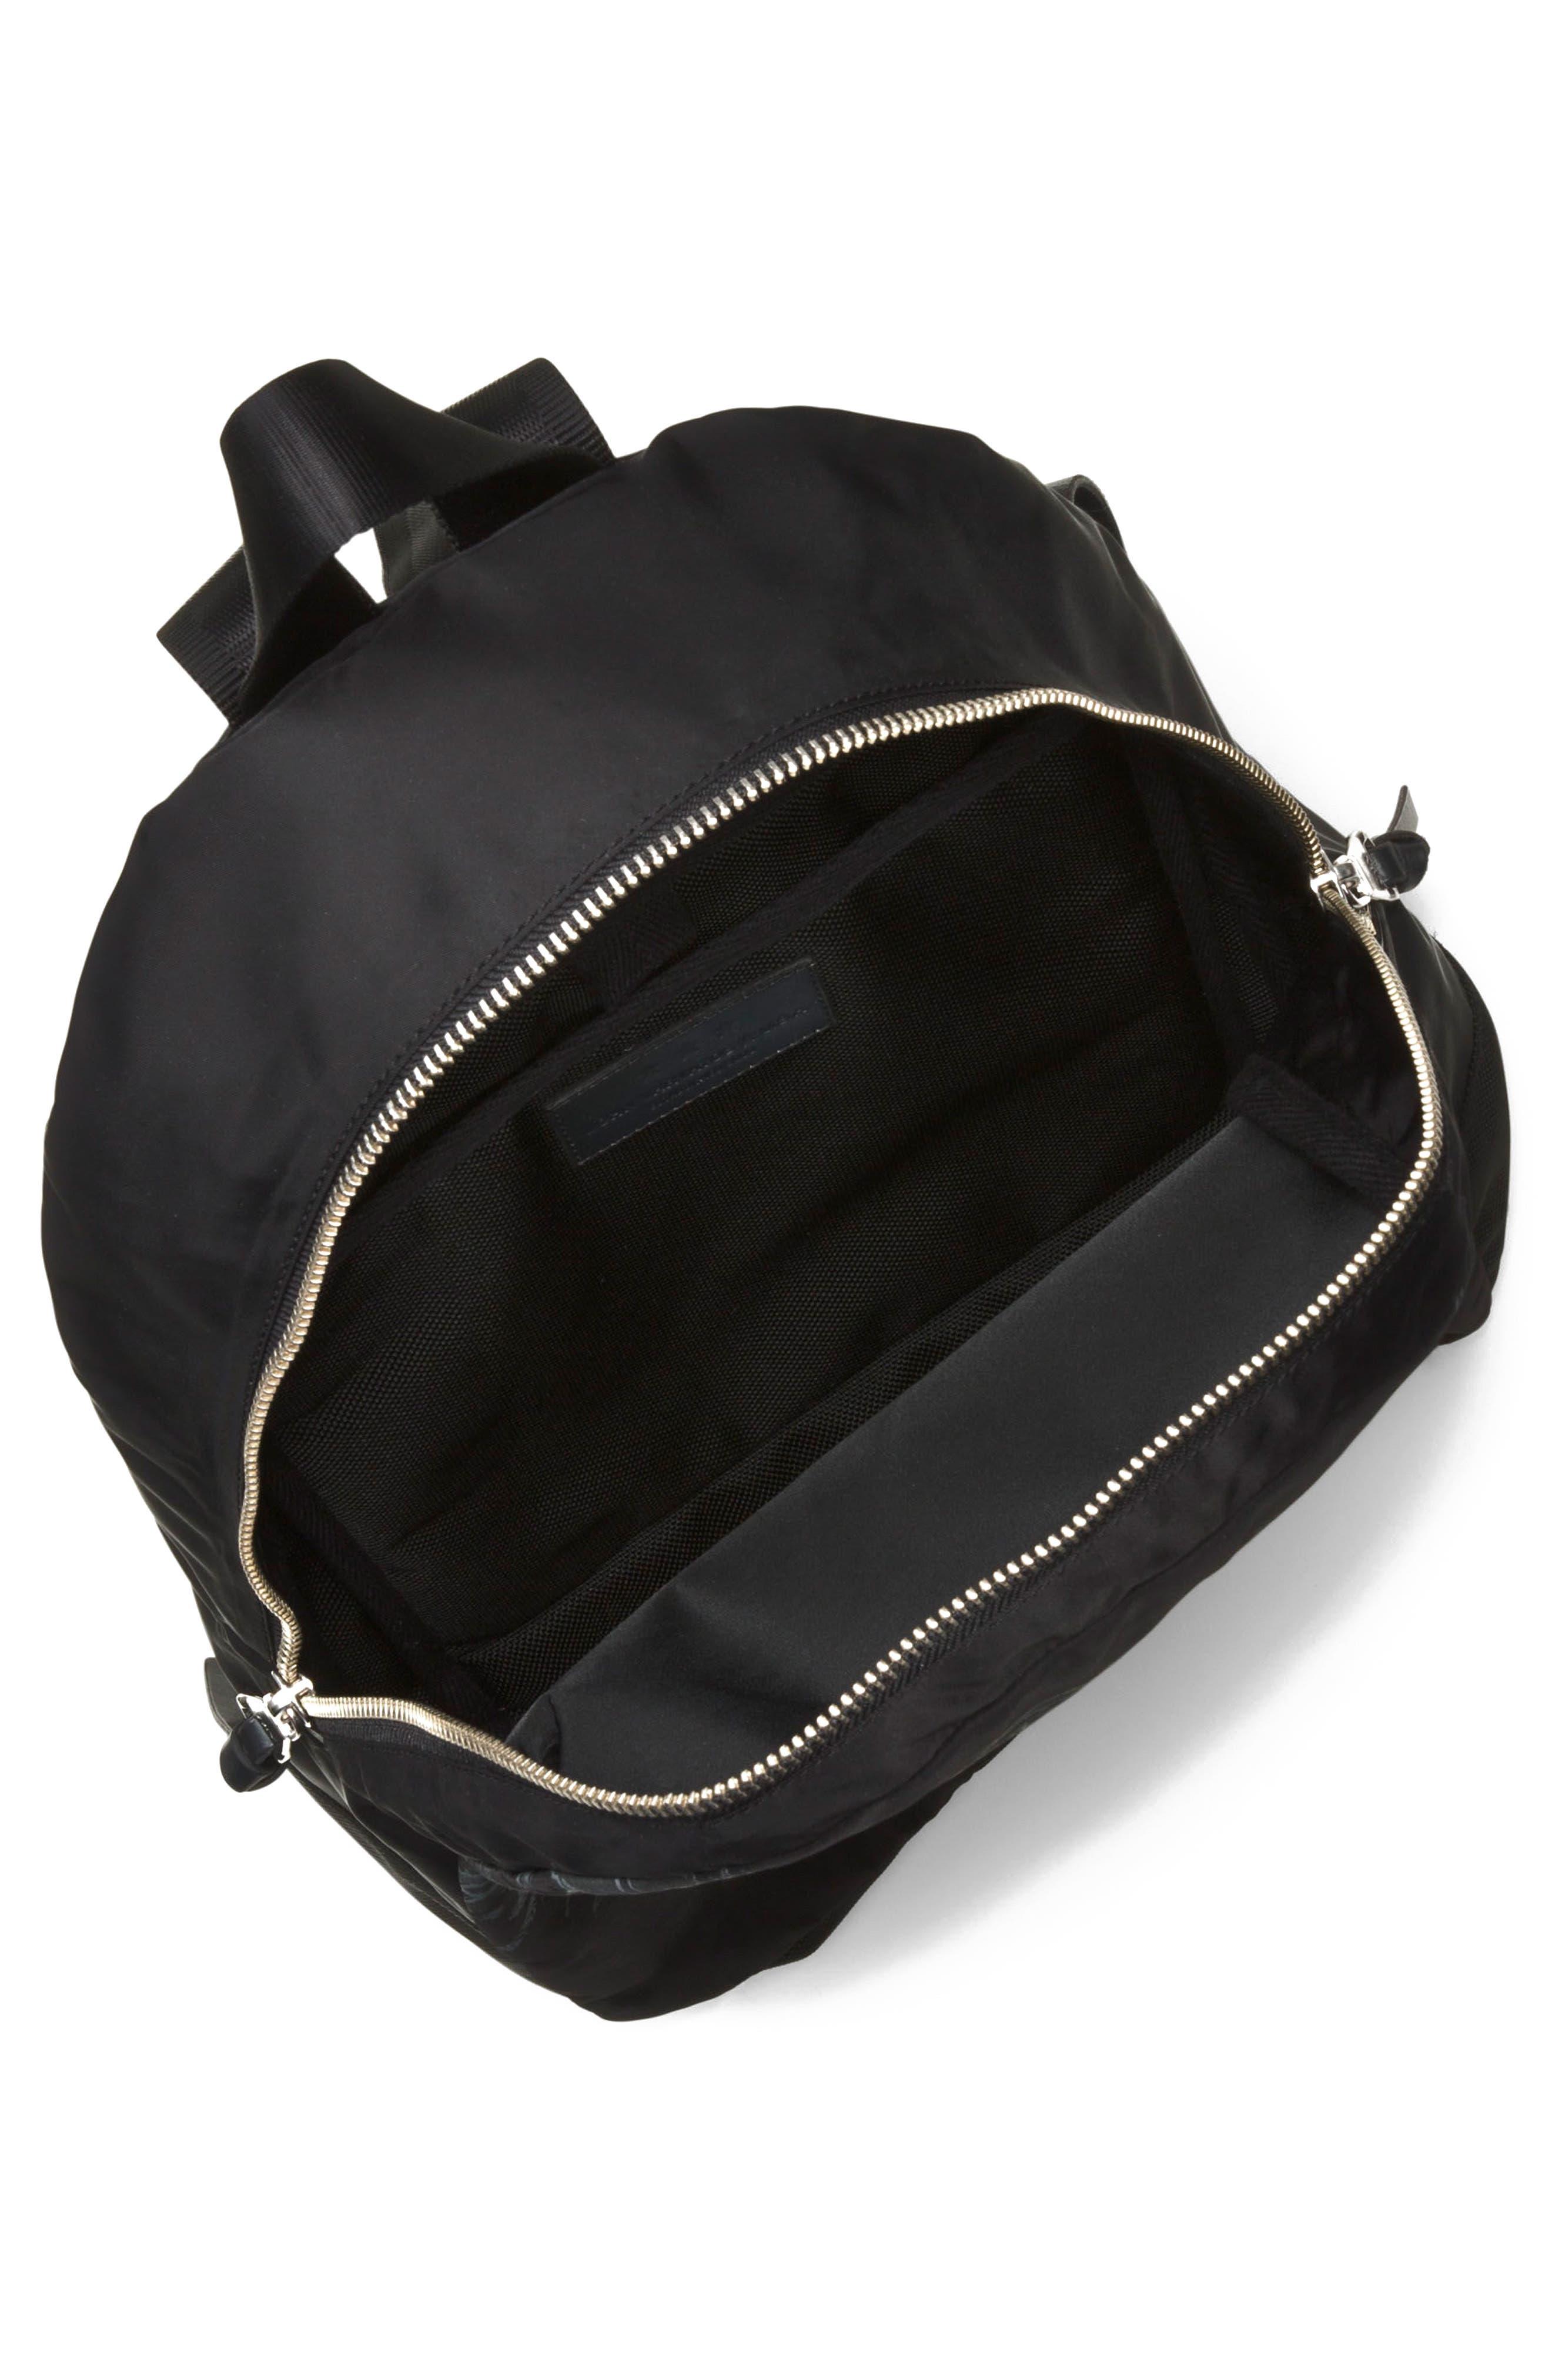 Tiger Print Backpack,                             Alternate thumbnail 3, color,                             Black